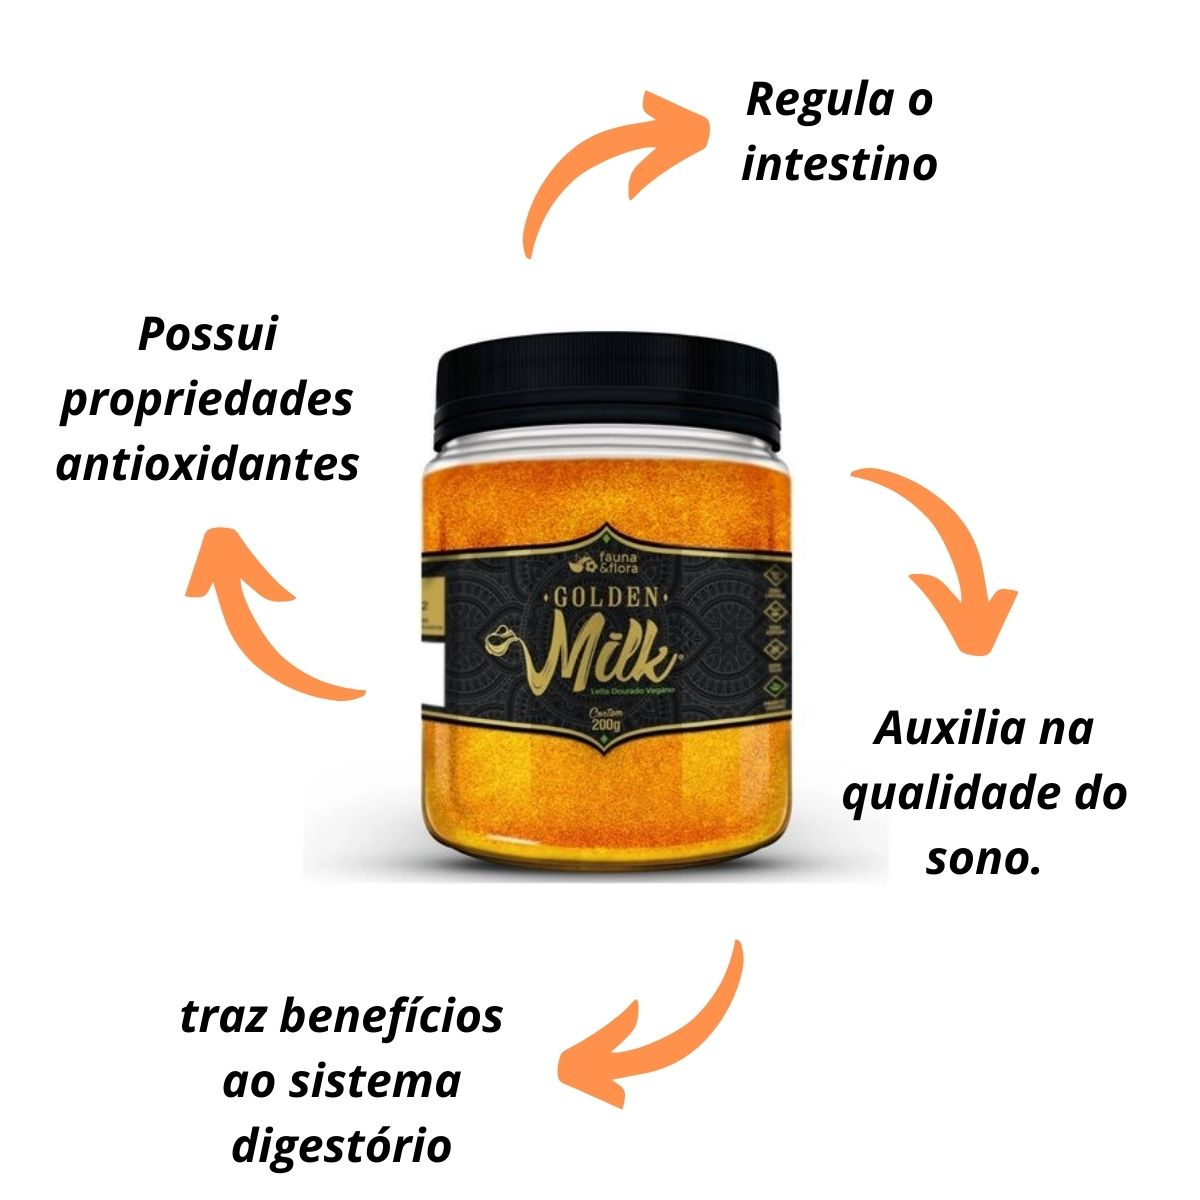 Golden Milk Leite Dourado Vegano 200g - Fauna&Flora